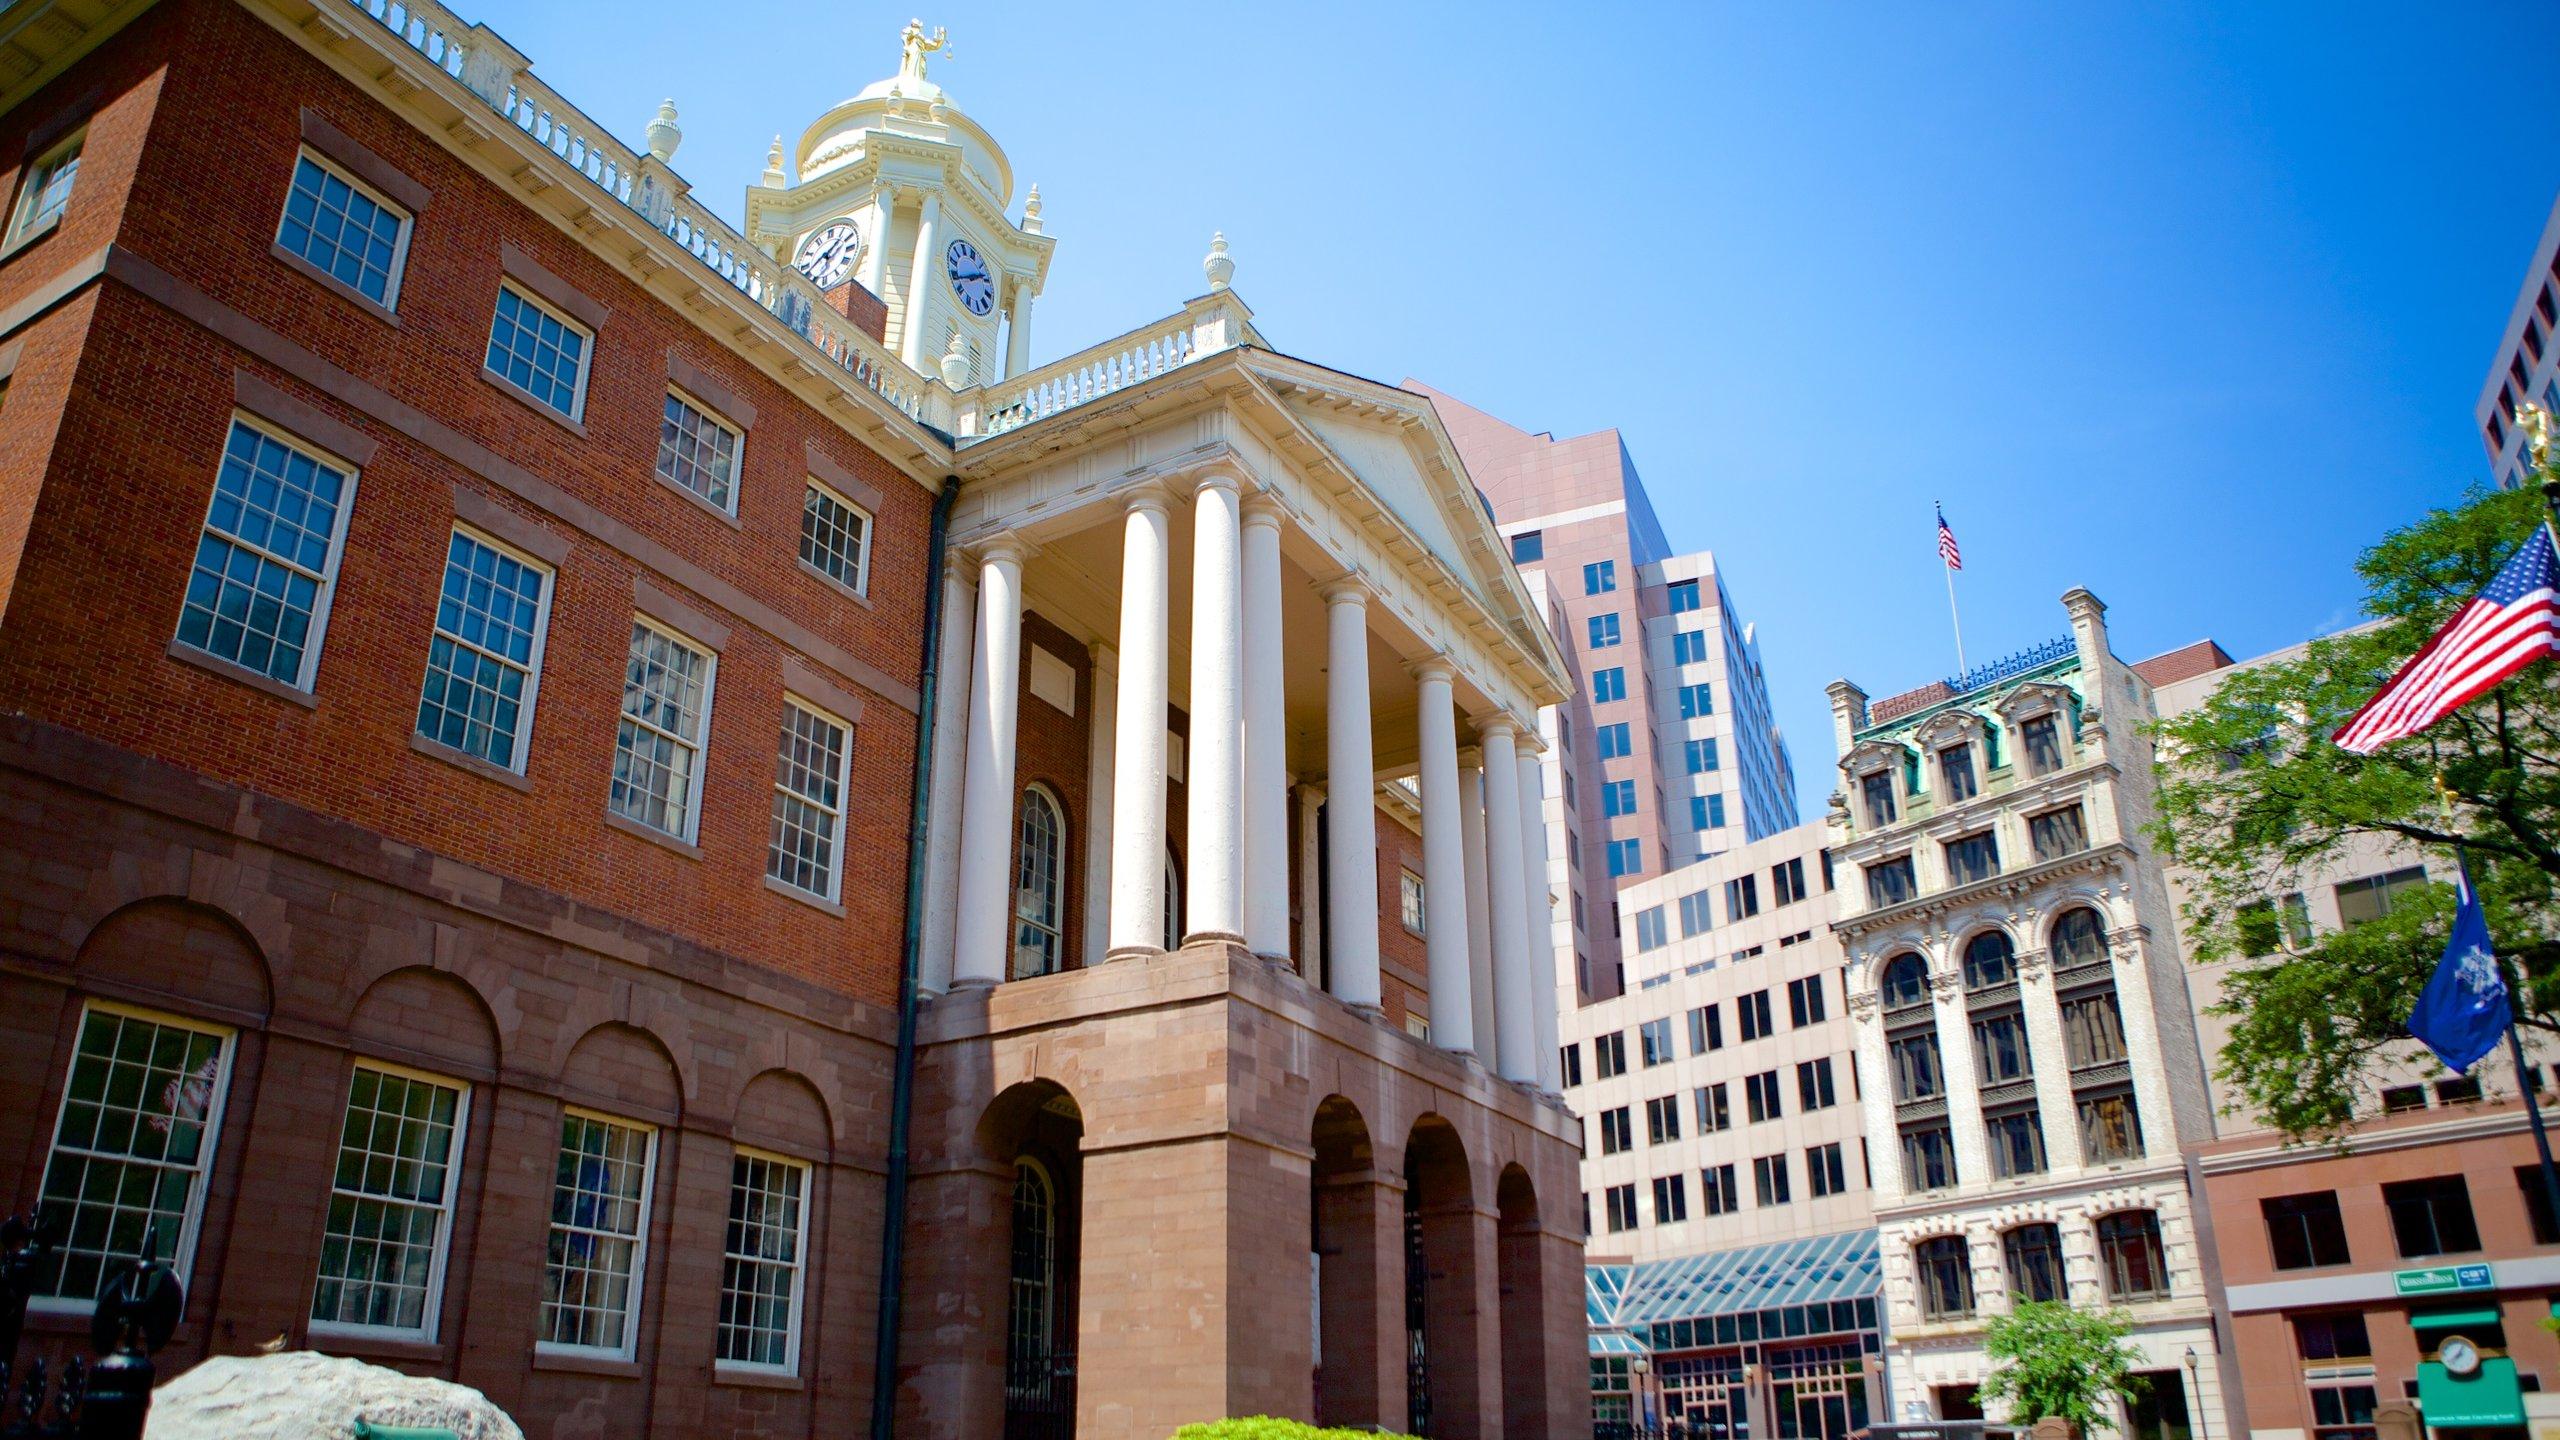 Hartford, Connecticut, United States of America